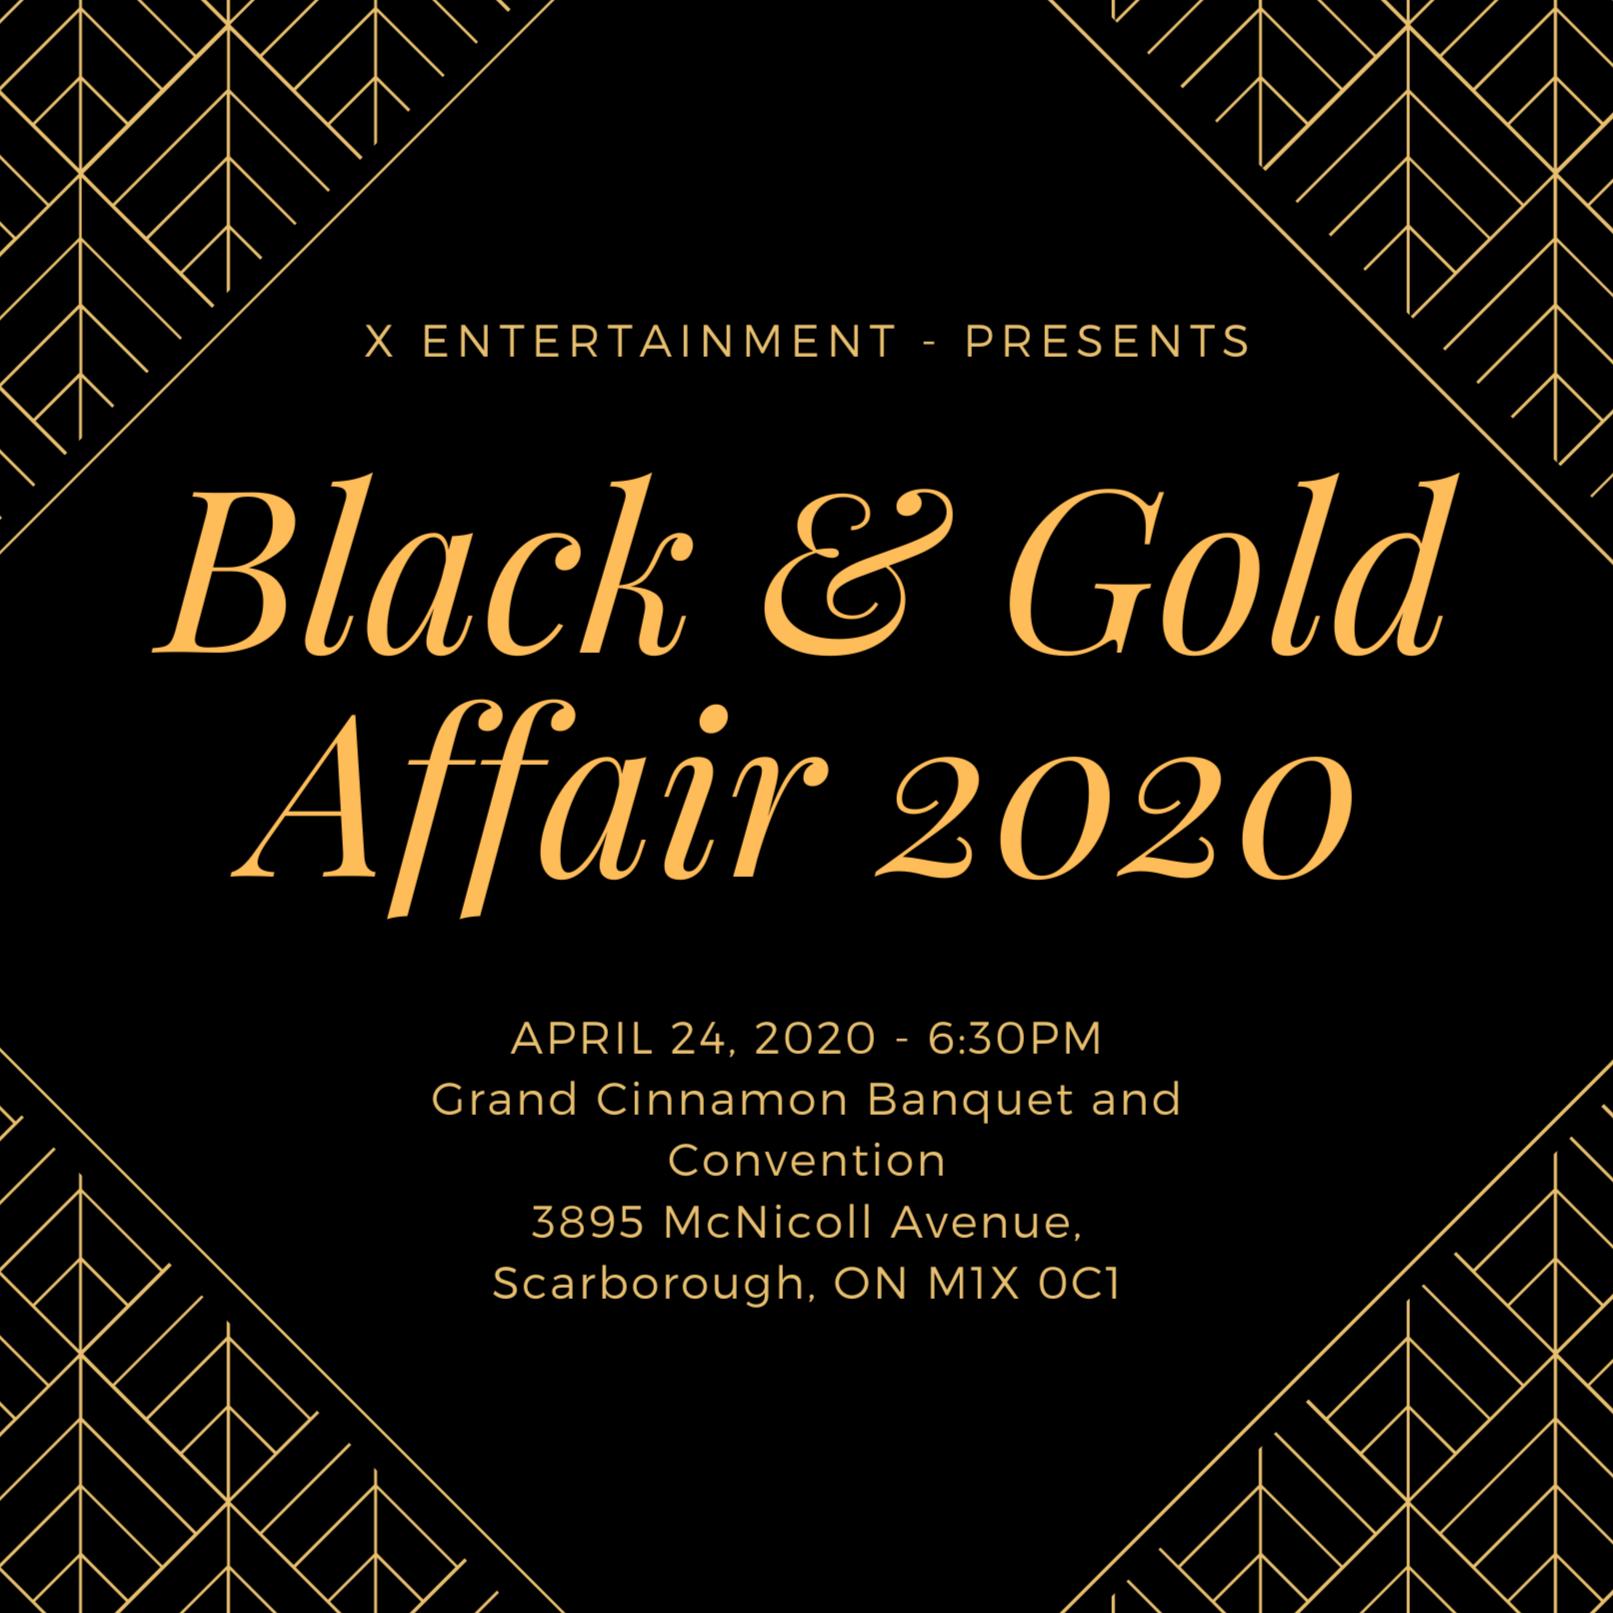 Black & Gold Affair 2020